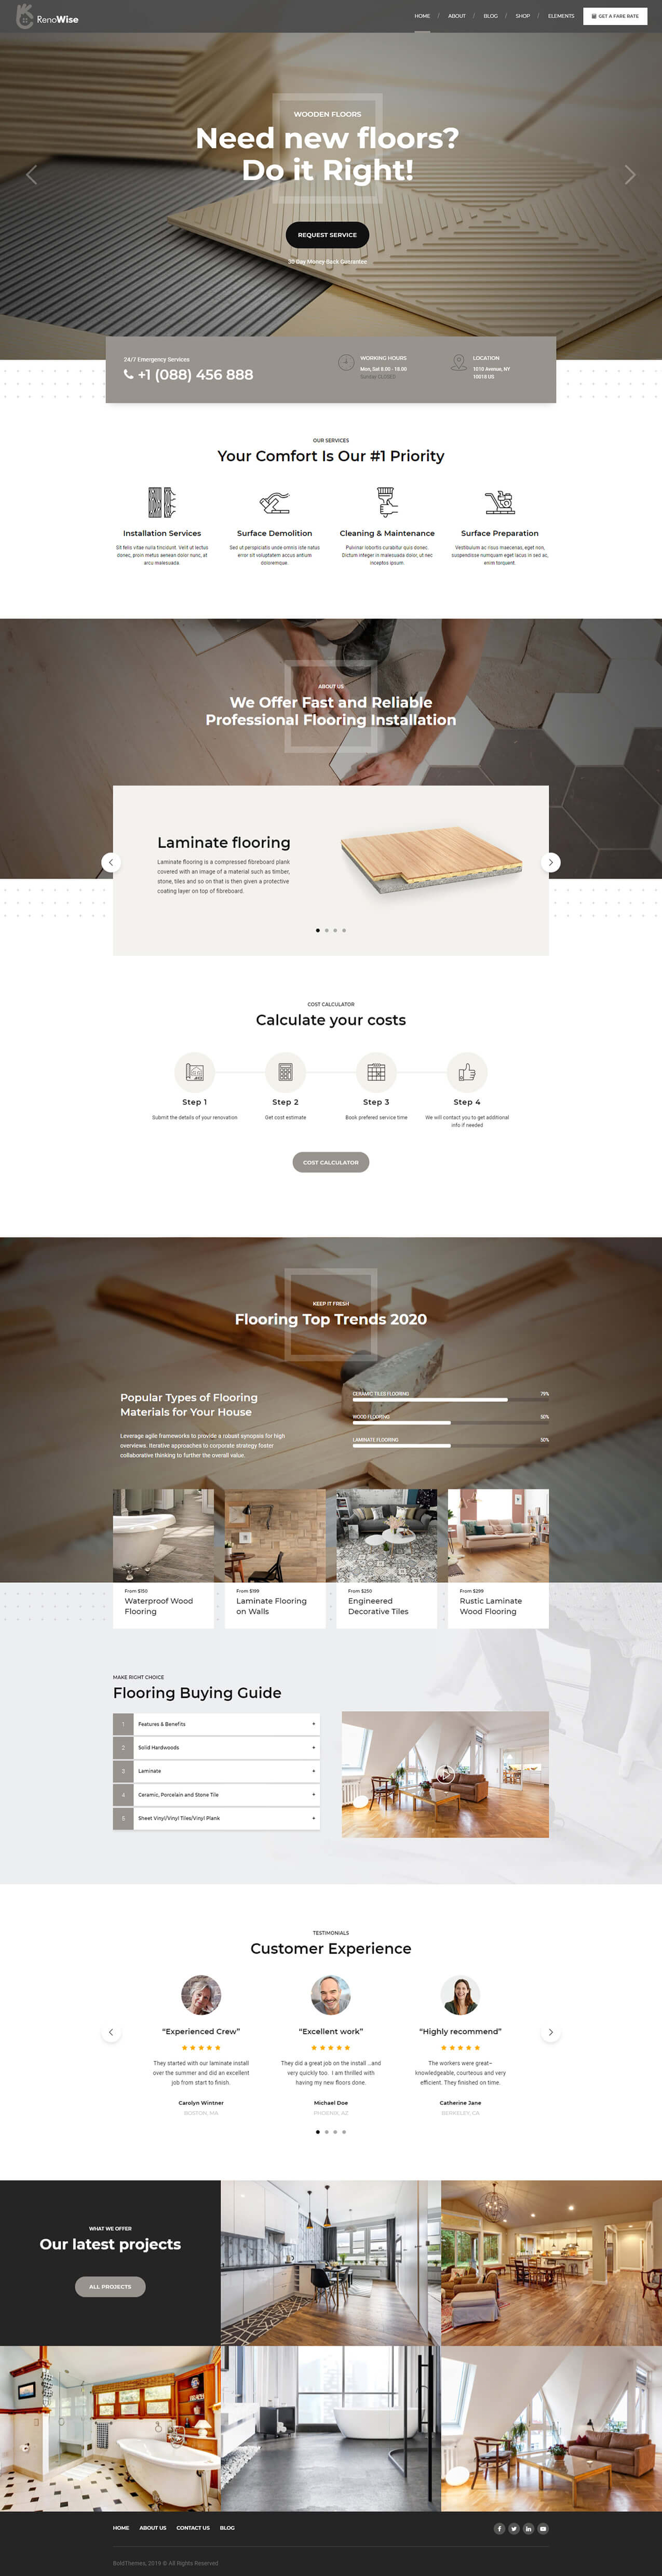 https://renowise.bold-themes.com/wp-content/uploads/2019/05/Flooring.jpg